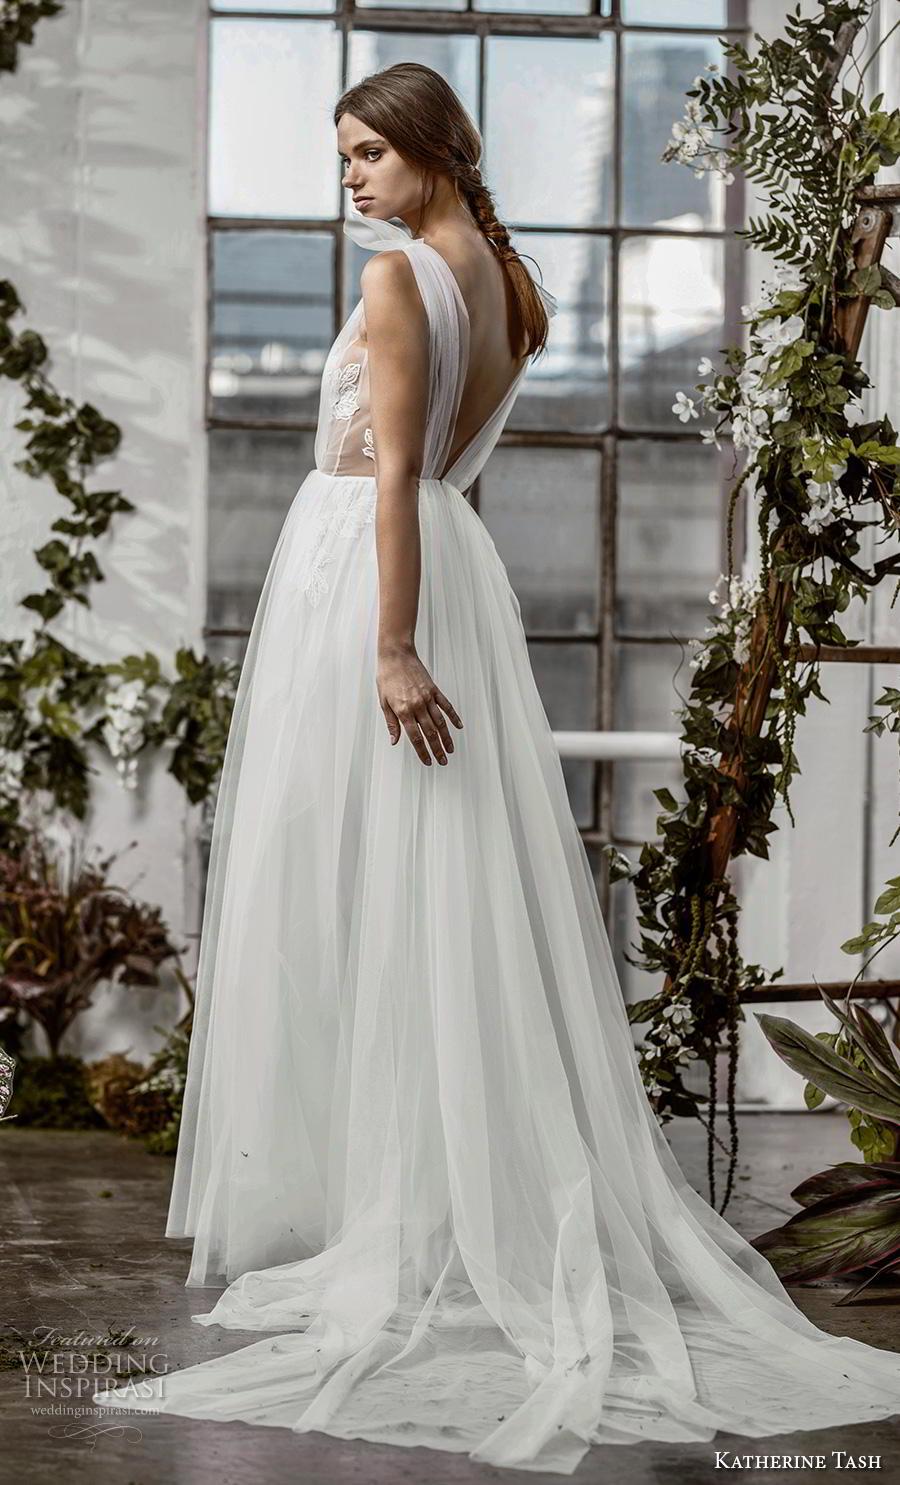 katherine tash fall 2019 bridal sleeveless illusion bateau v neck ruched embellished bodice romantic soft a  line wedding dress open v back chapel train (9) sdv